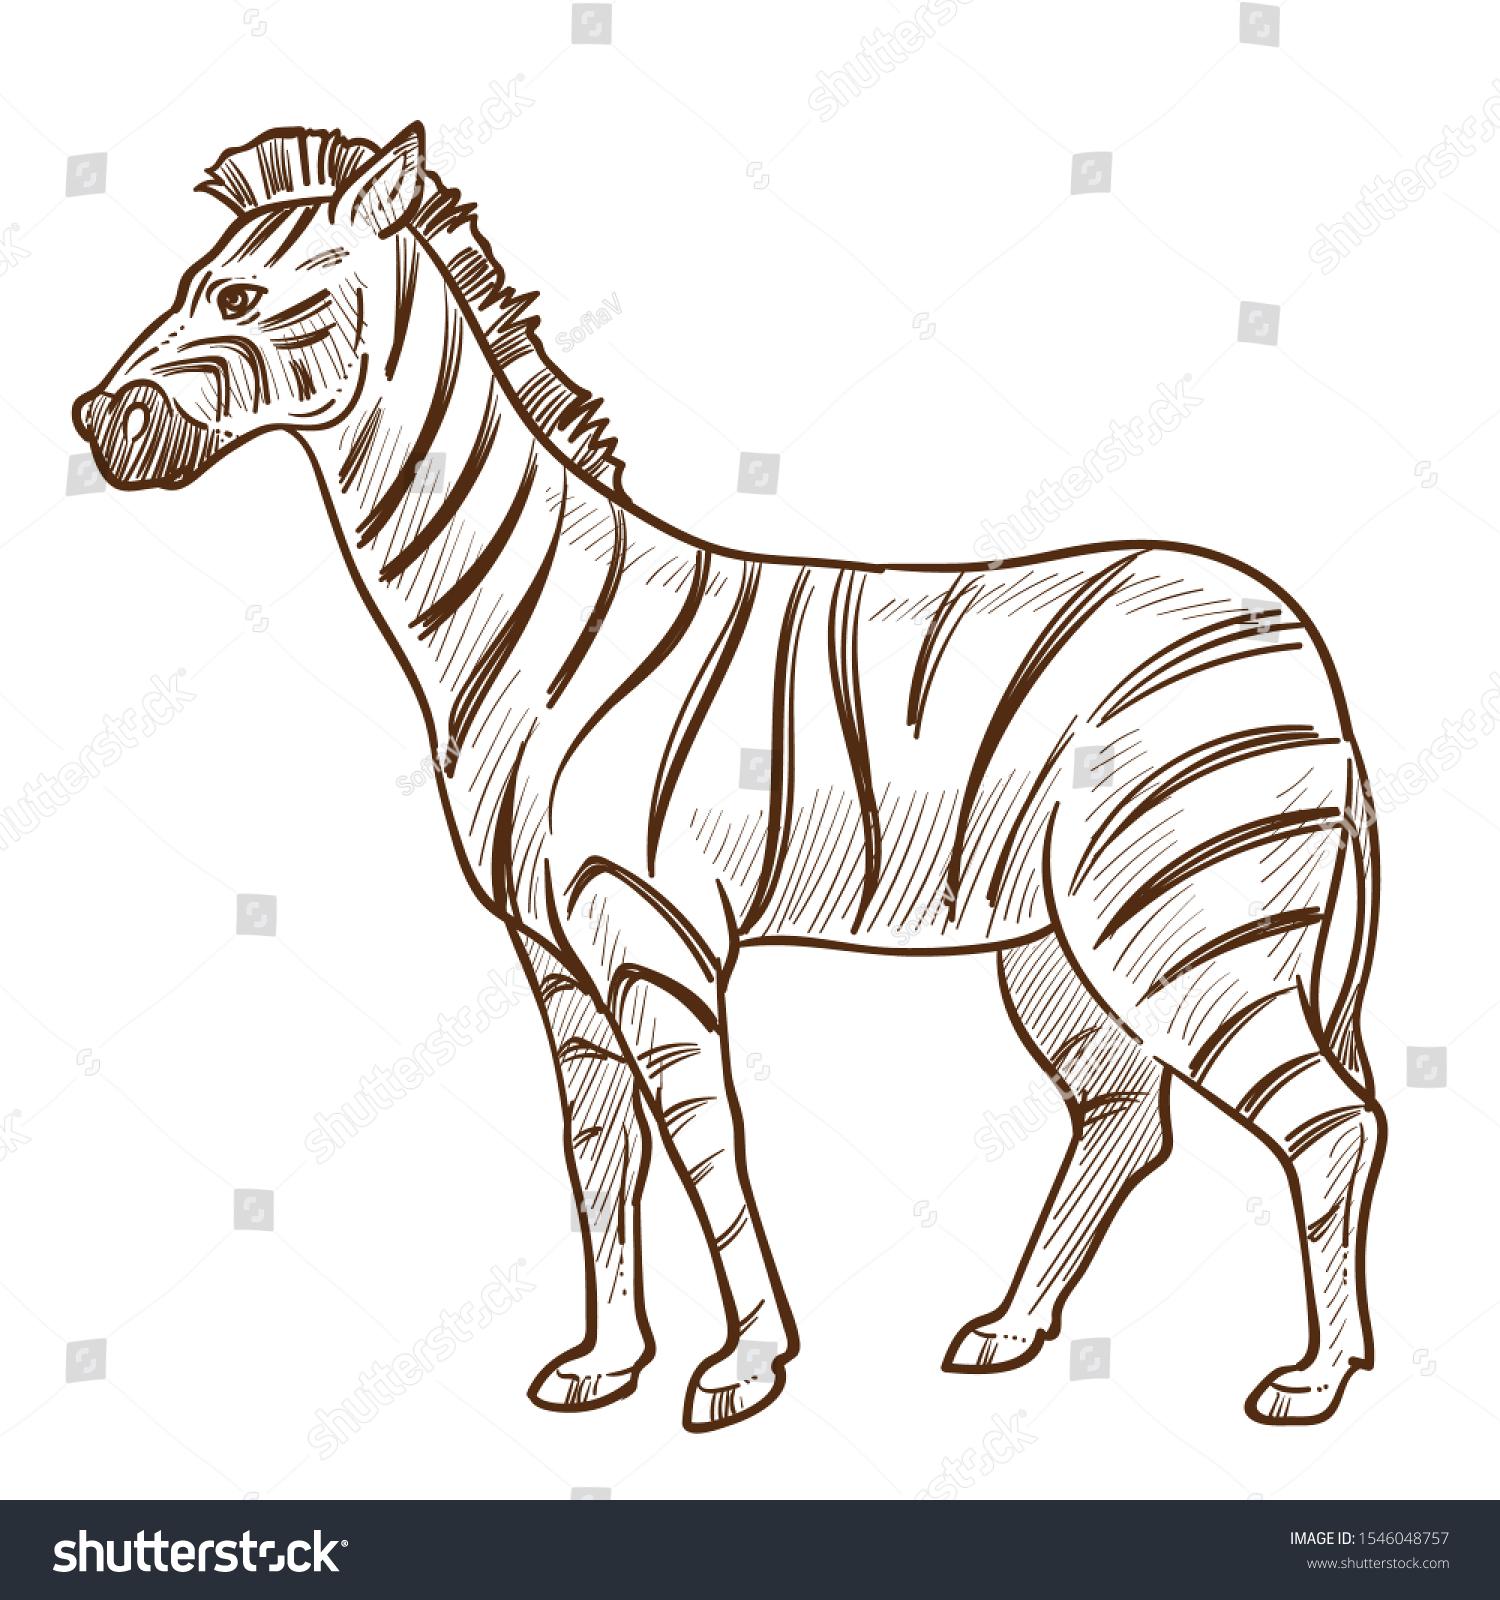 Zebra Isolated Sketch African Savannah Wild Stock Vector (Royalty Free)  1546048757